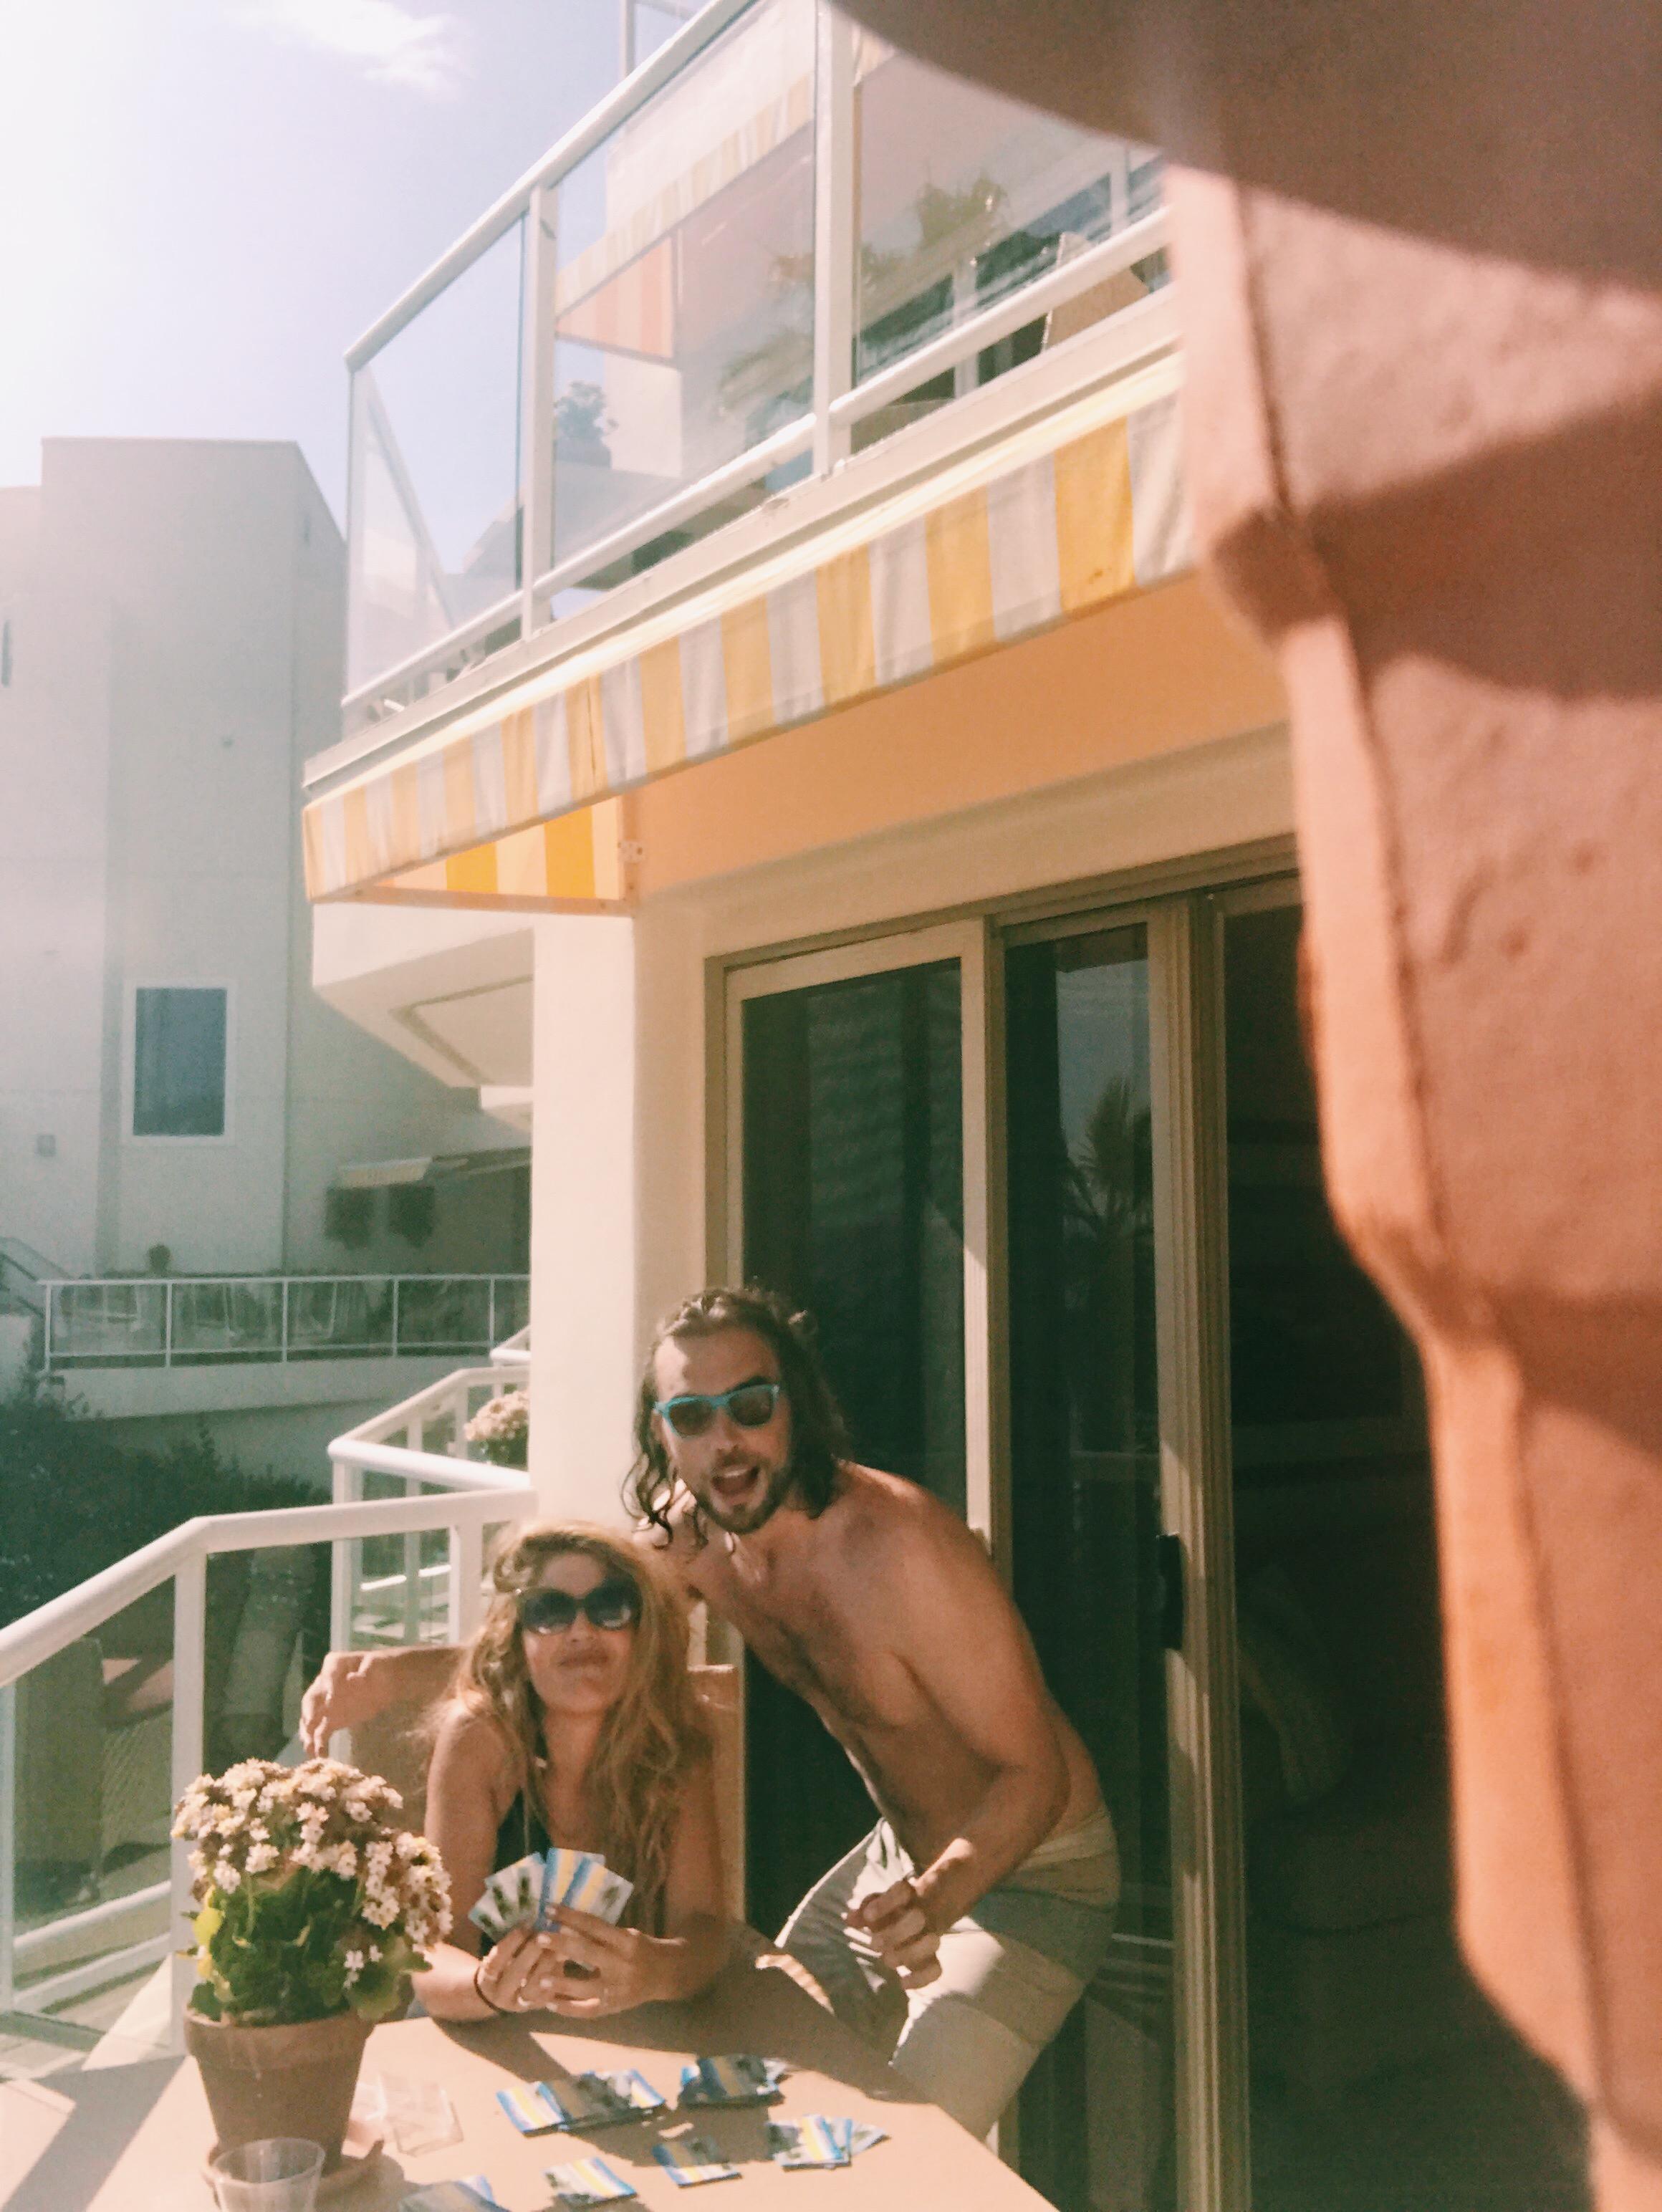 inn at laguna beach balcony fashionveggie and husband